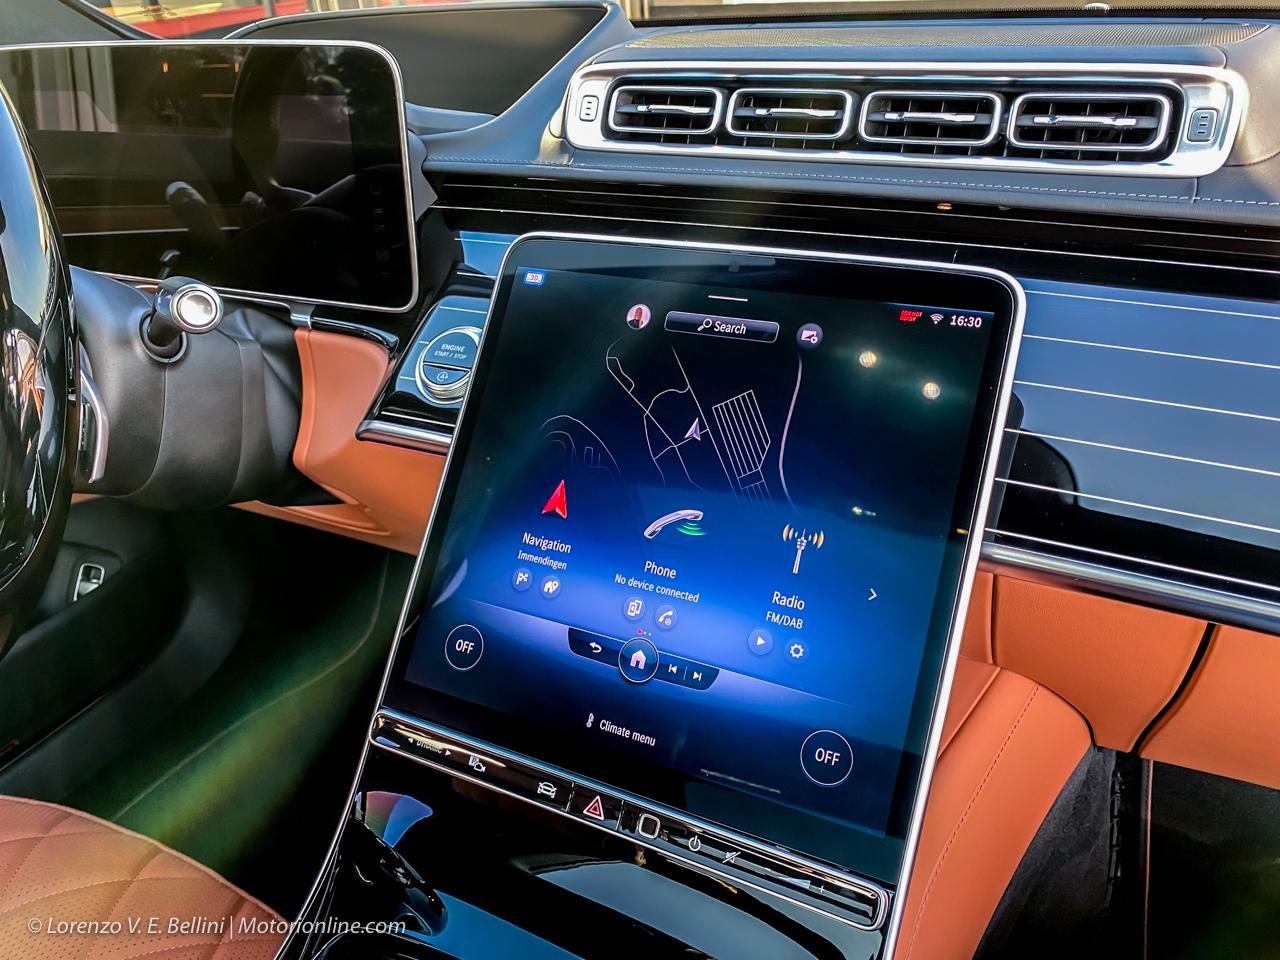 Mercedes Classe S 2020 - Prova su strada in anteprima